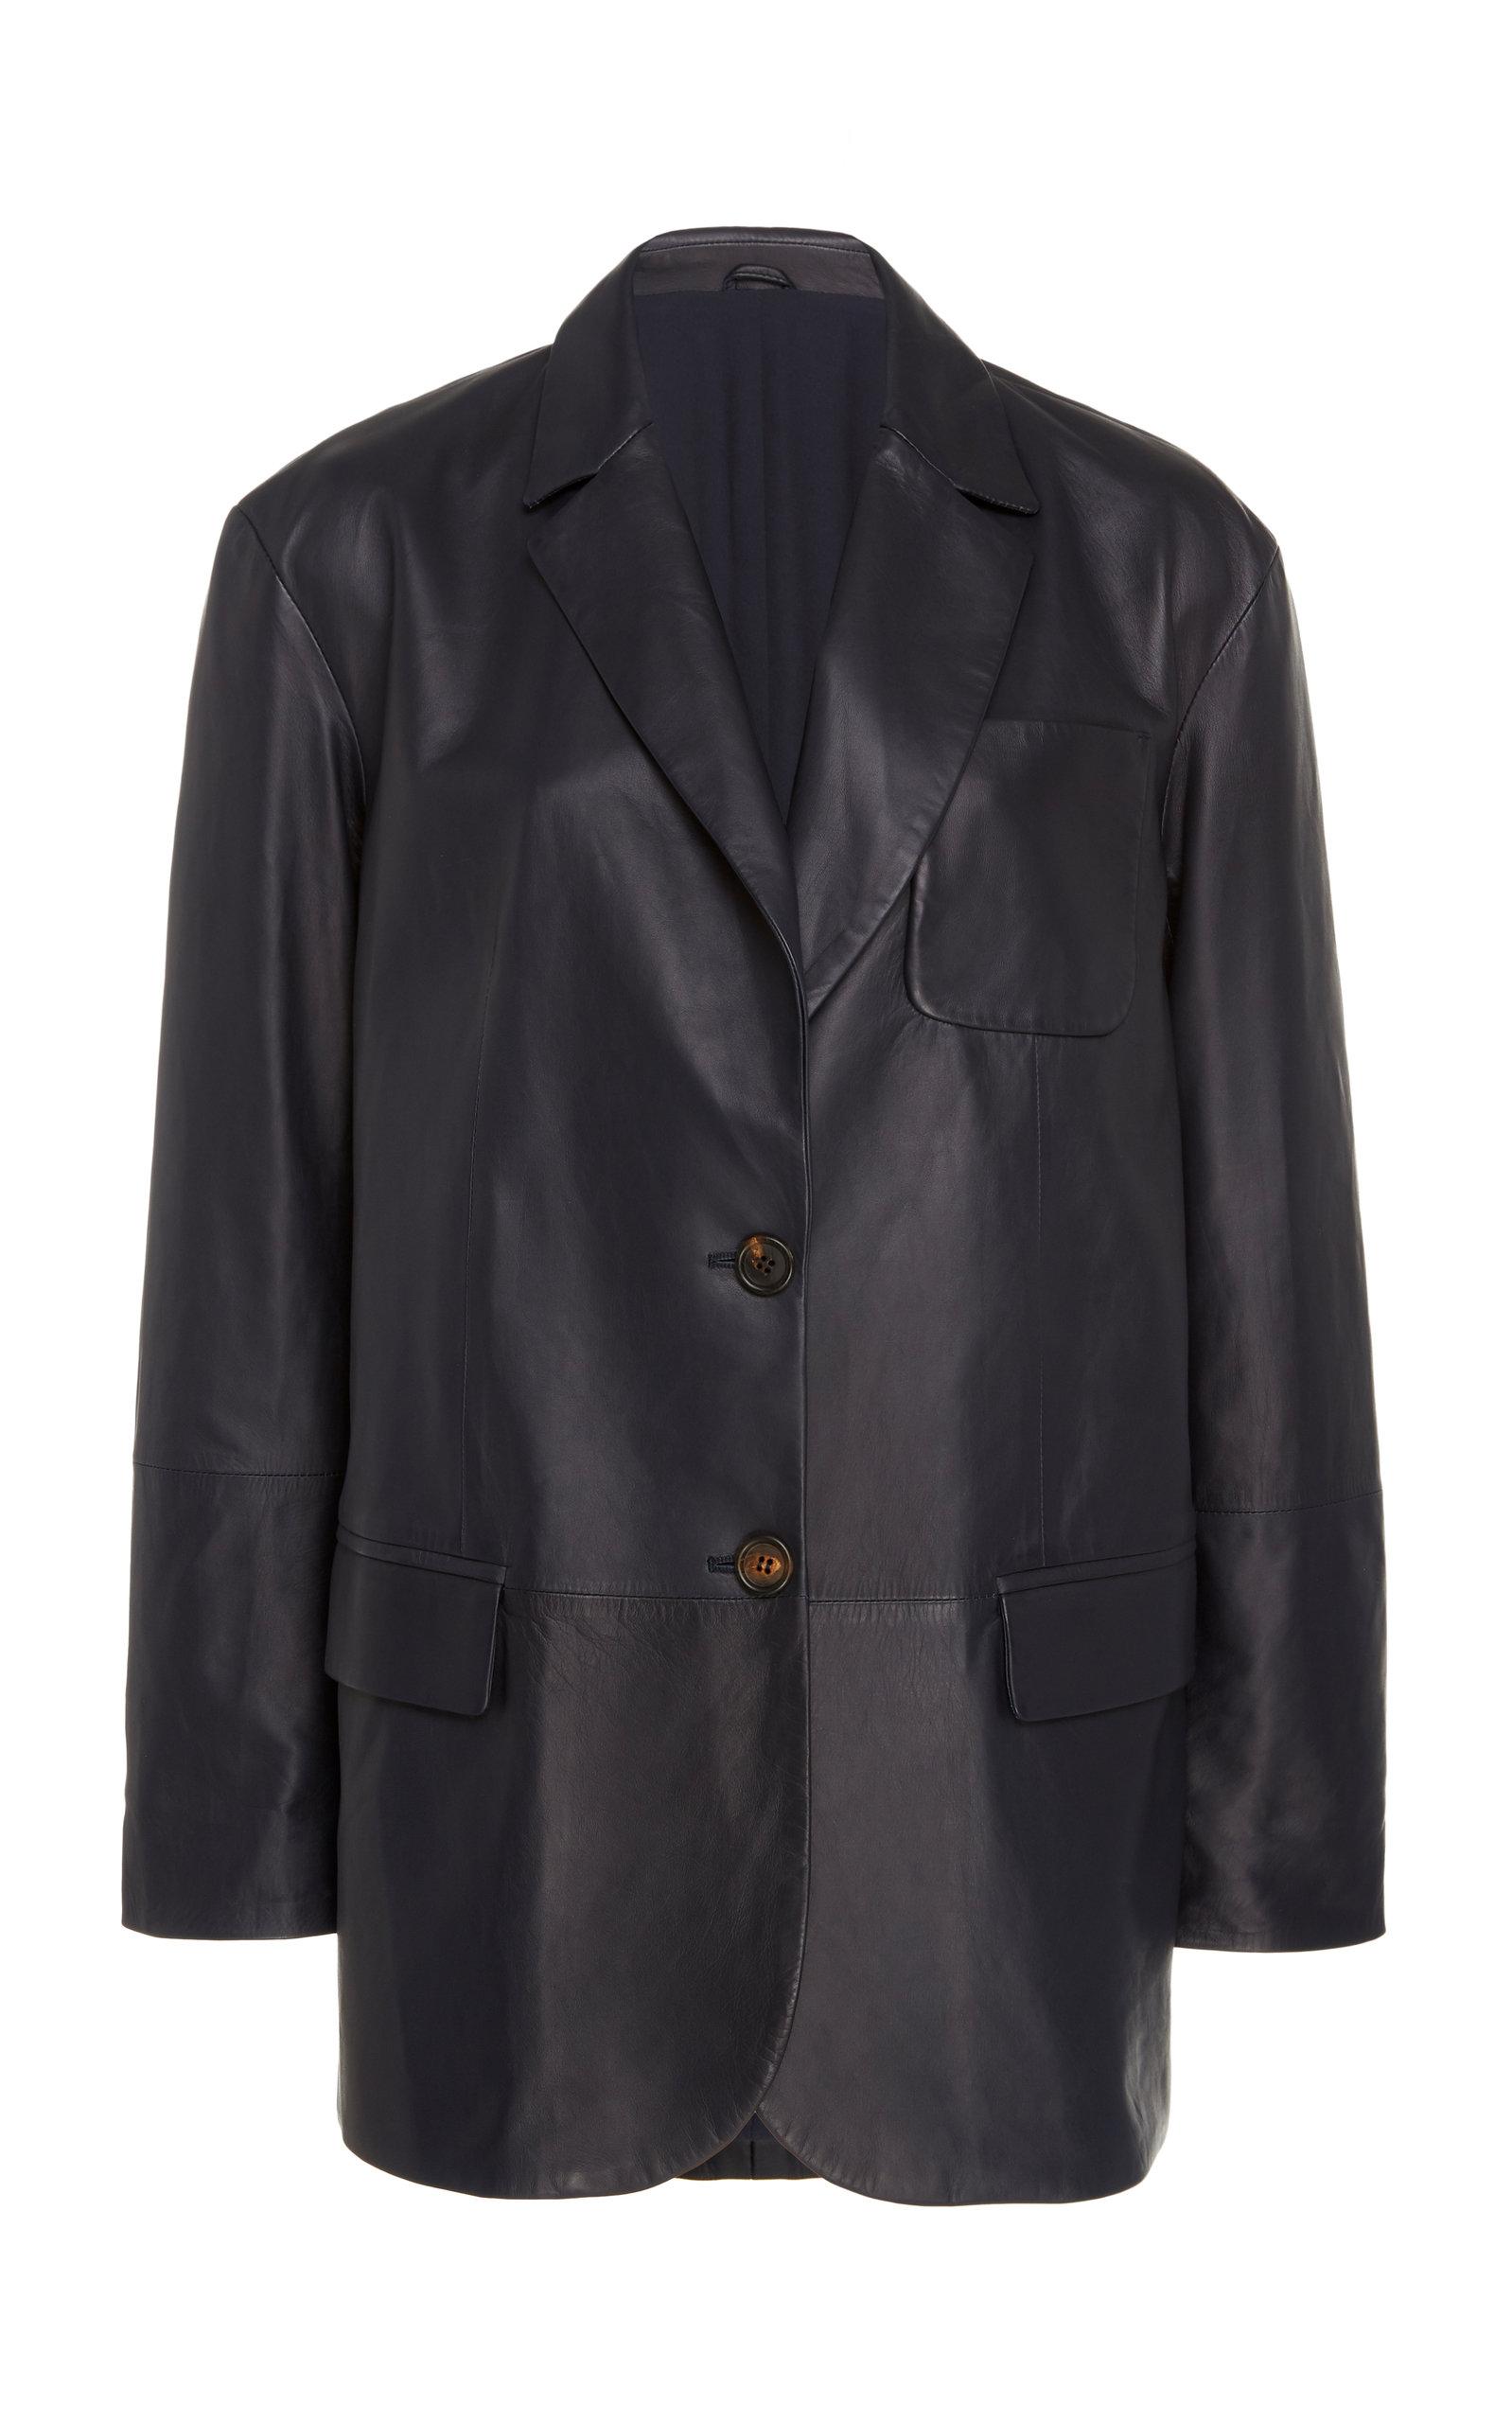 066f2e652 Leather Jacket